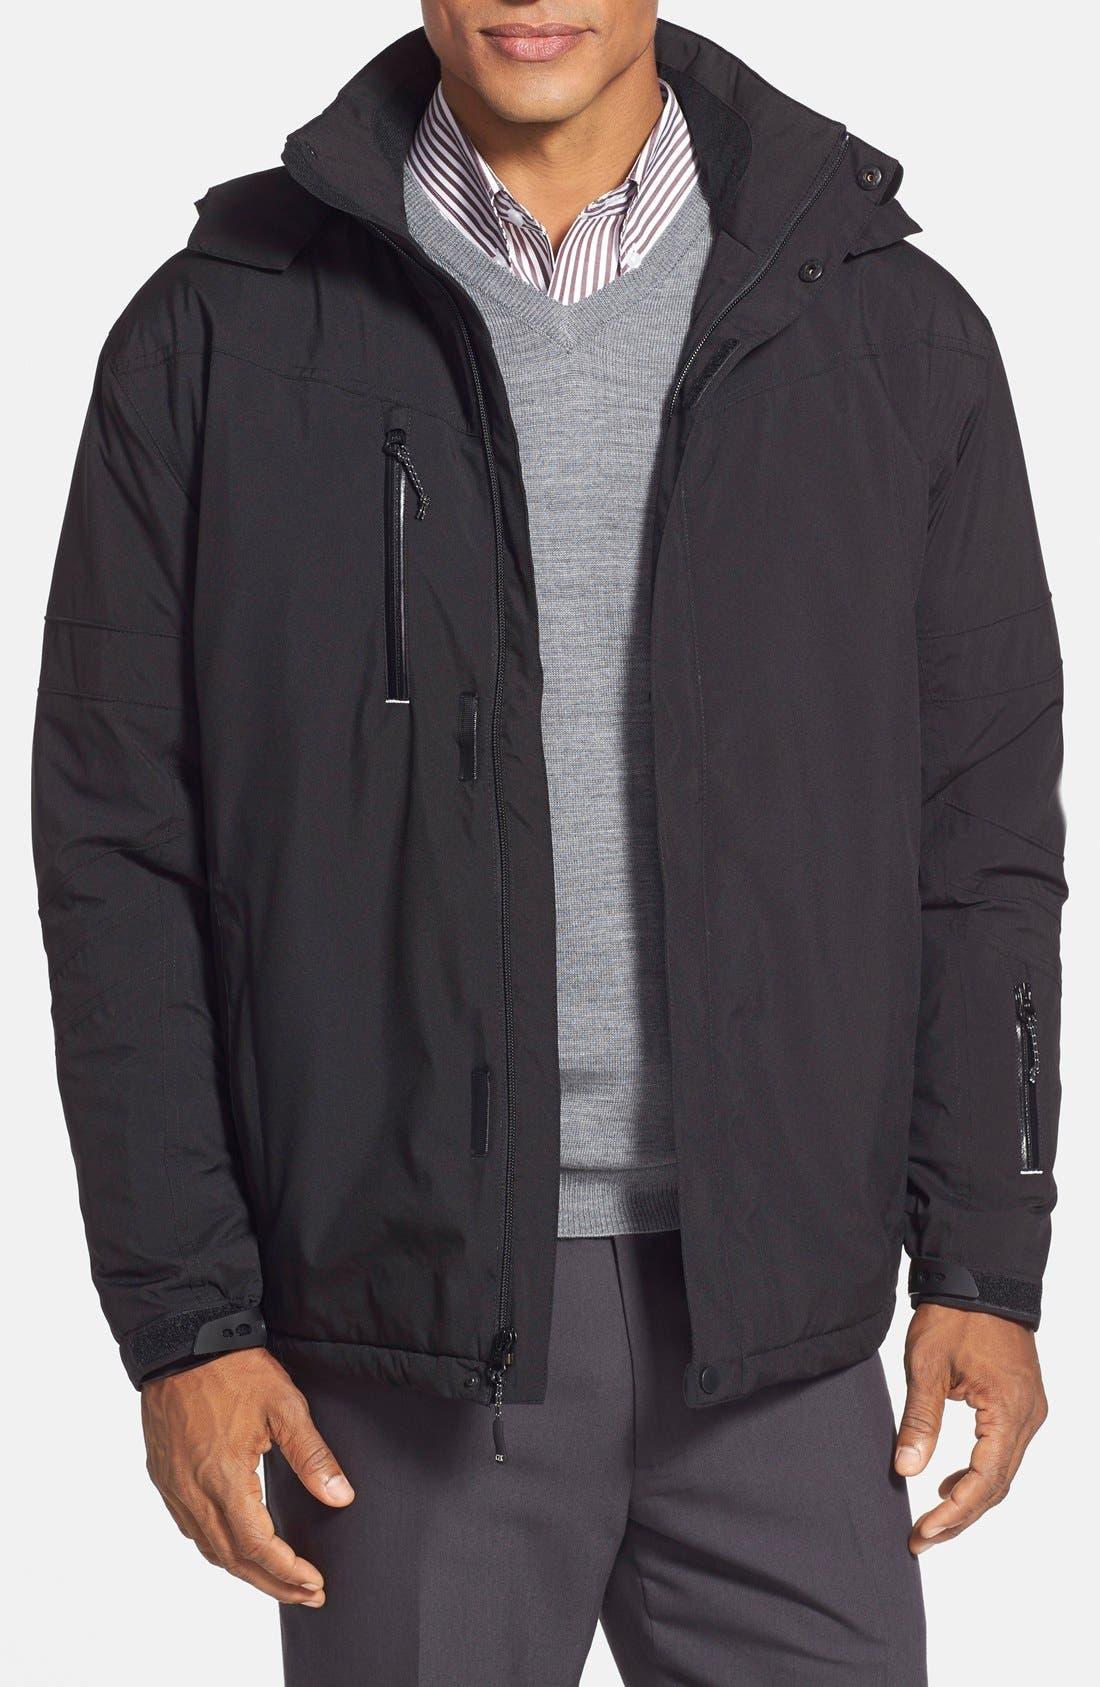 Alternate Image 1 Selected - Cutter & Buck 'WeatherTec Sanders' Jacket (Online Only)